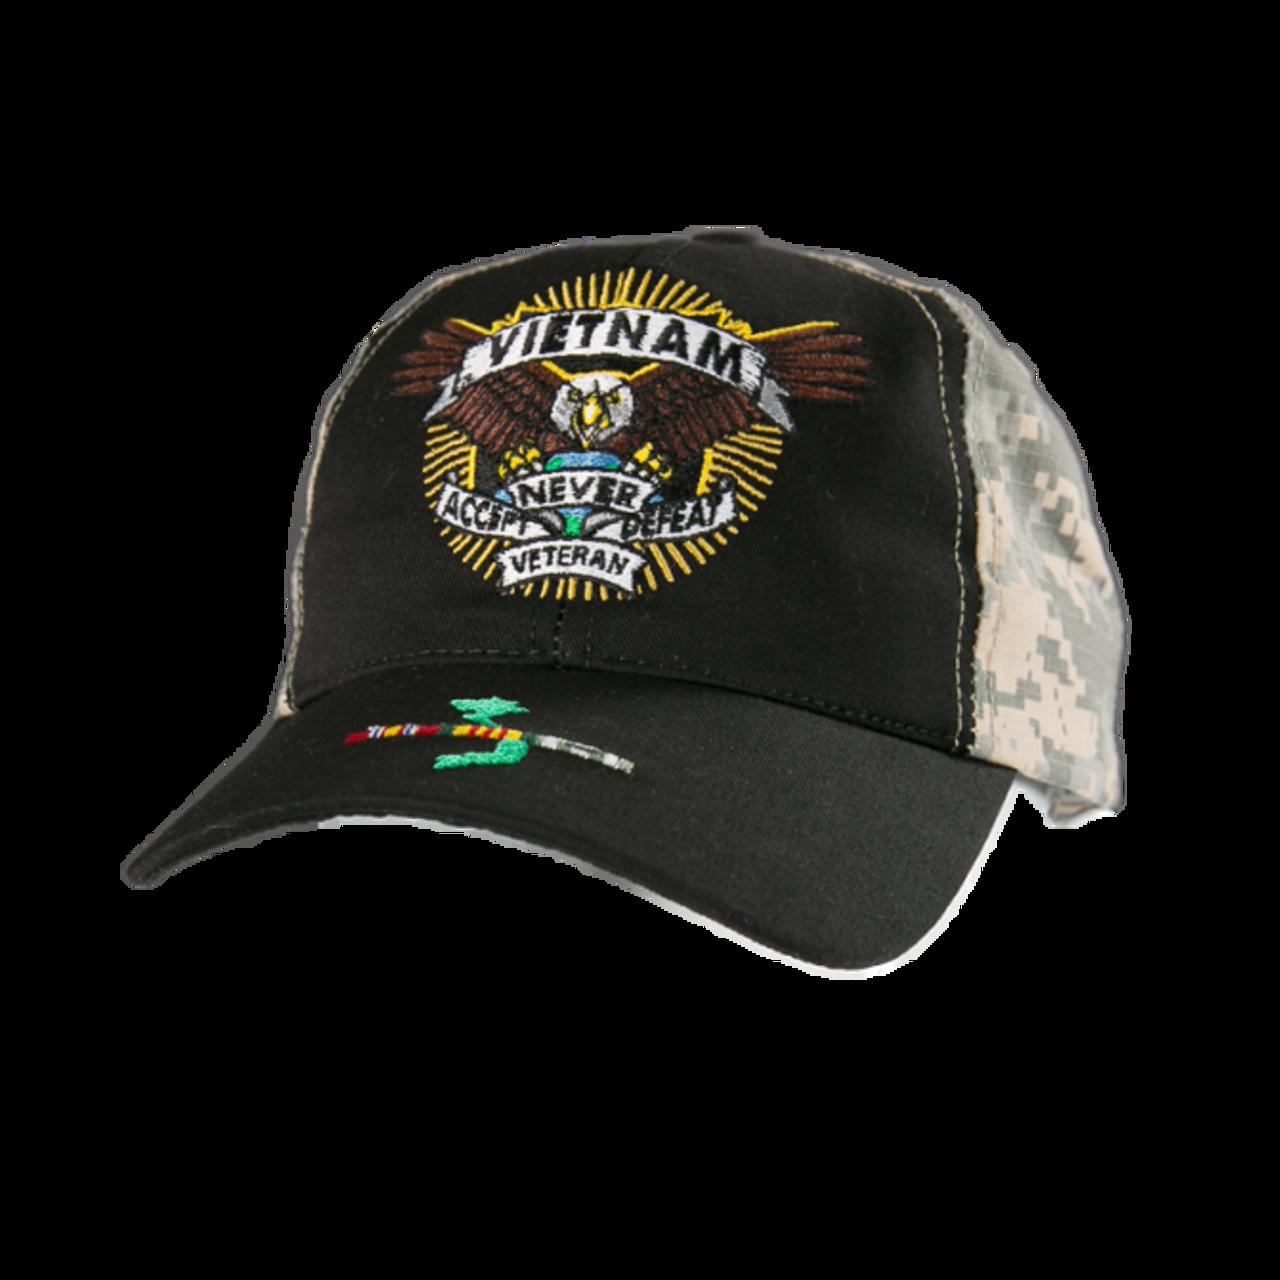 98b8ce41879e3 23404 - Made In USA Military Hat - Vietnam Veteran - Defender ...